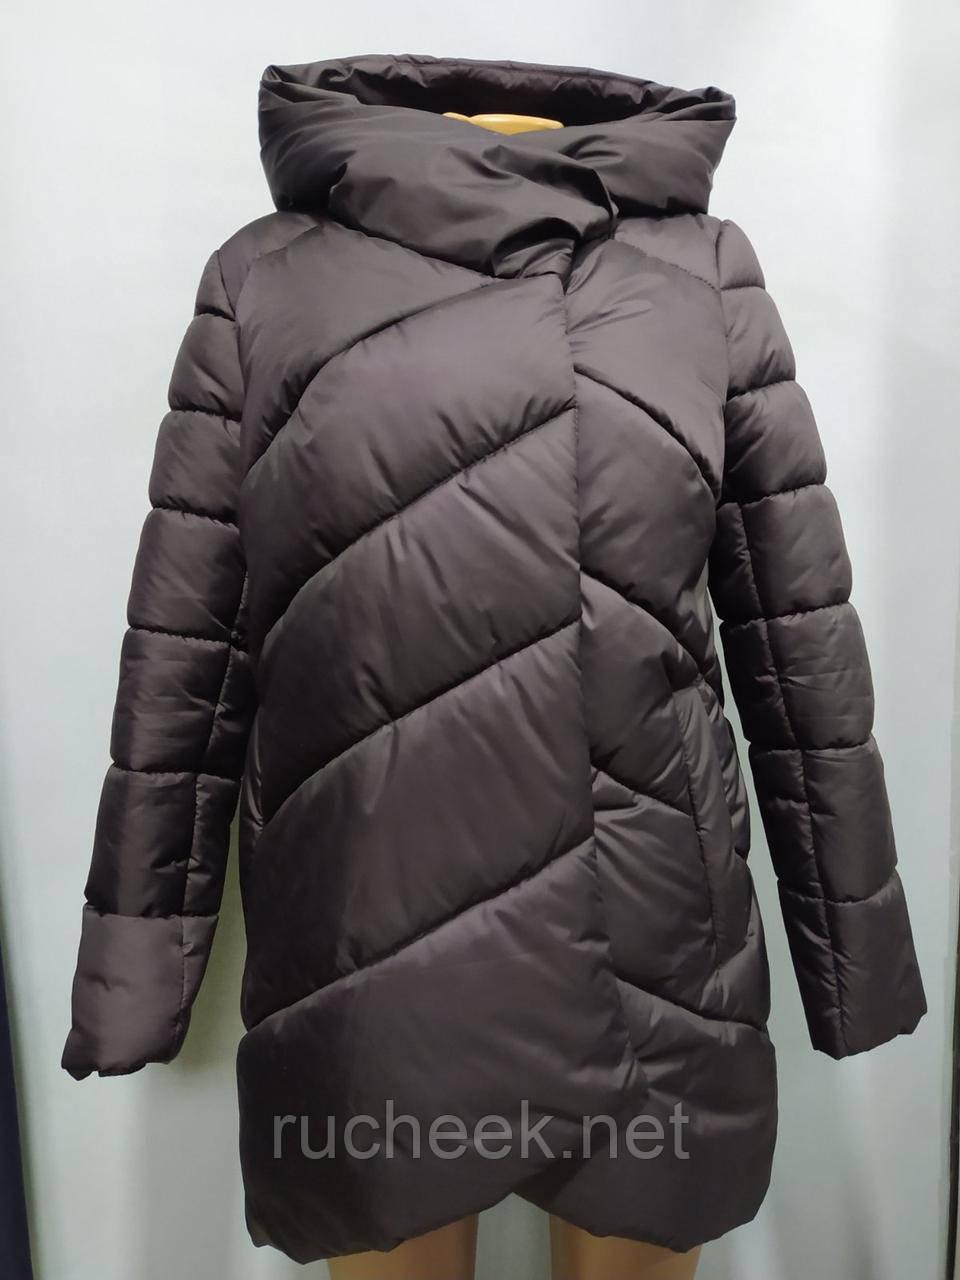 Зимняя куртка женская размер 46-48 цвет шоколад. Mangelo модель 221